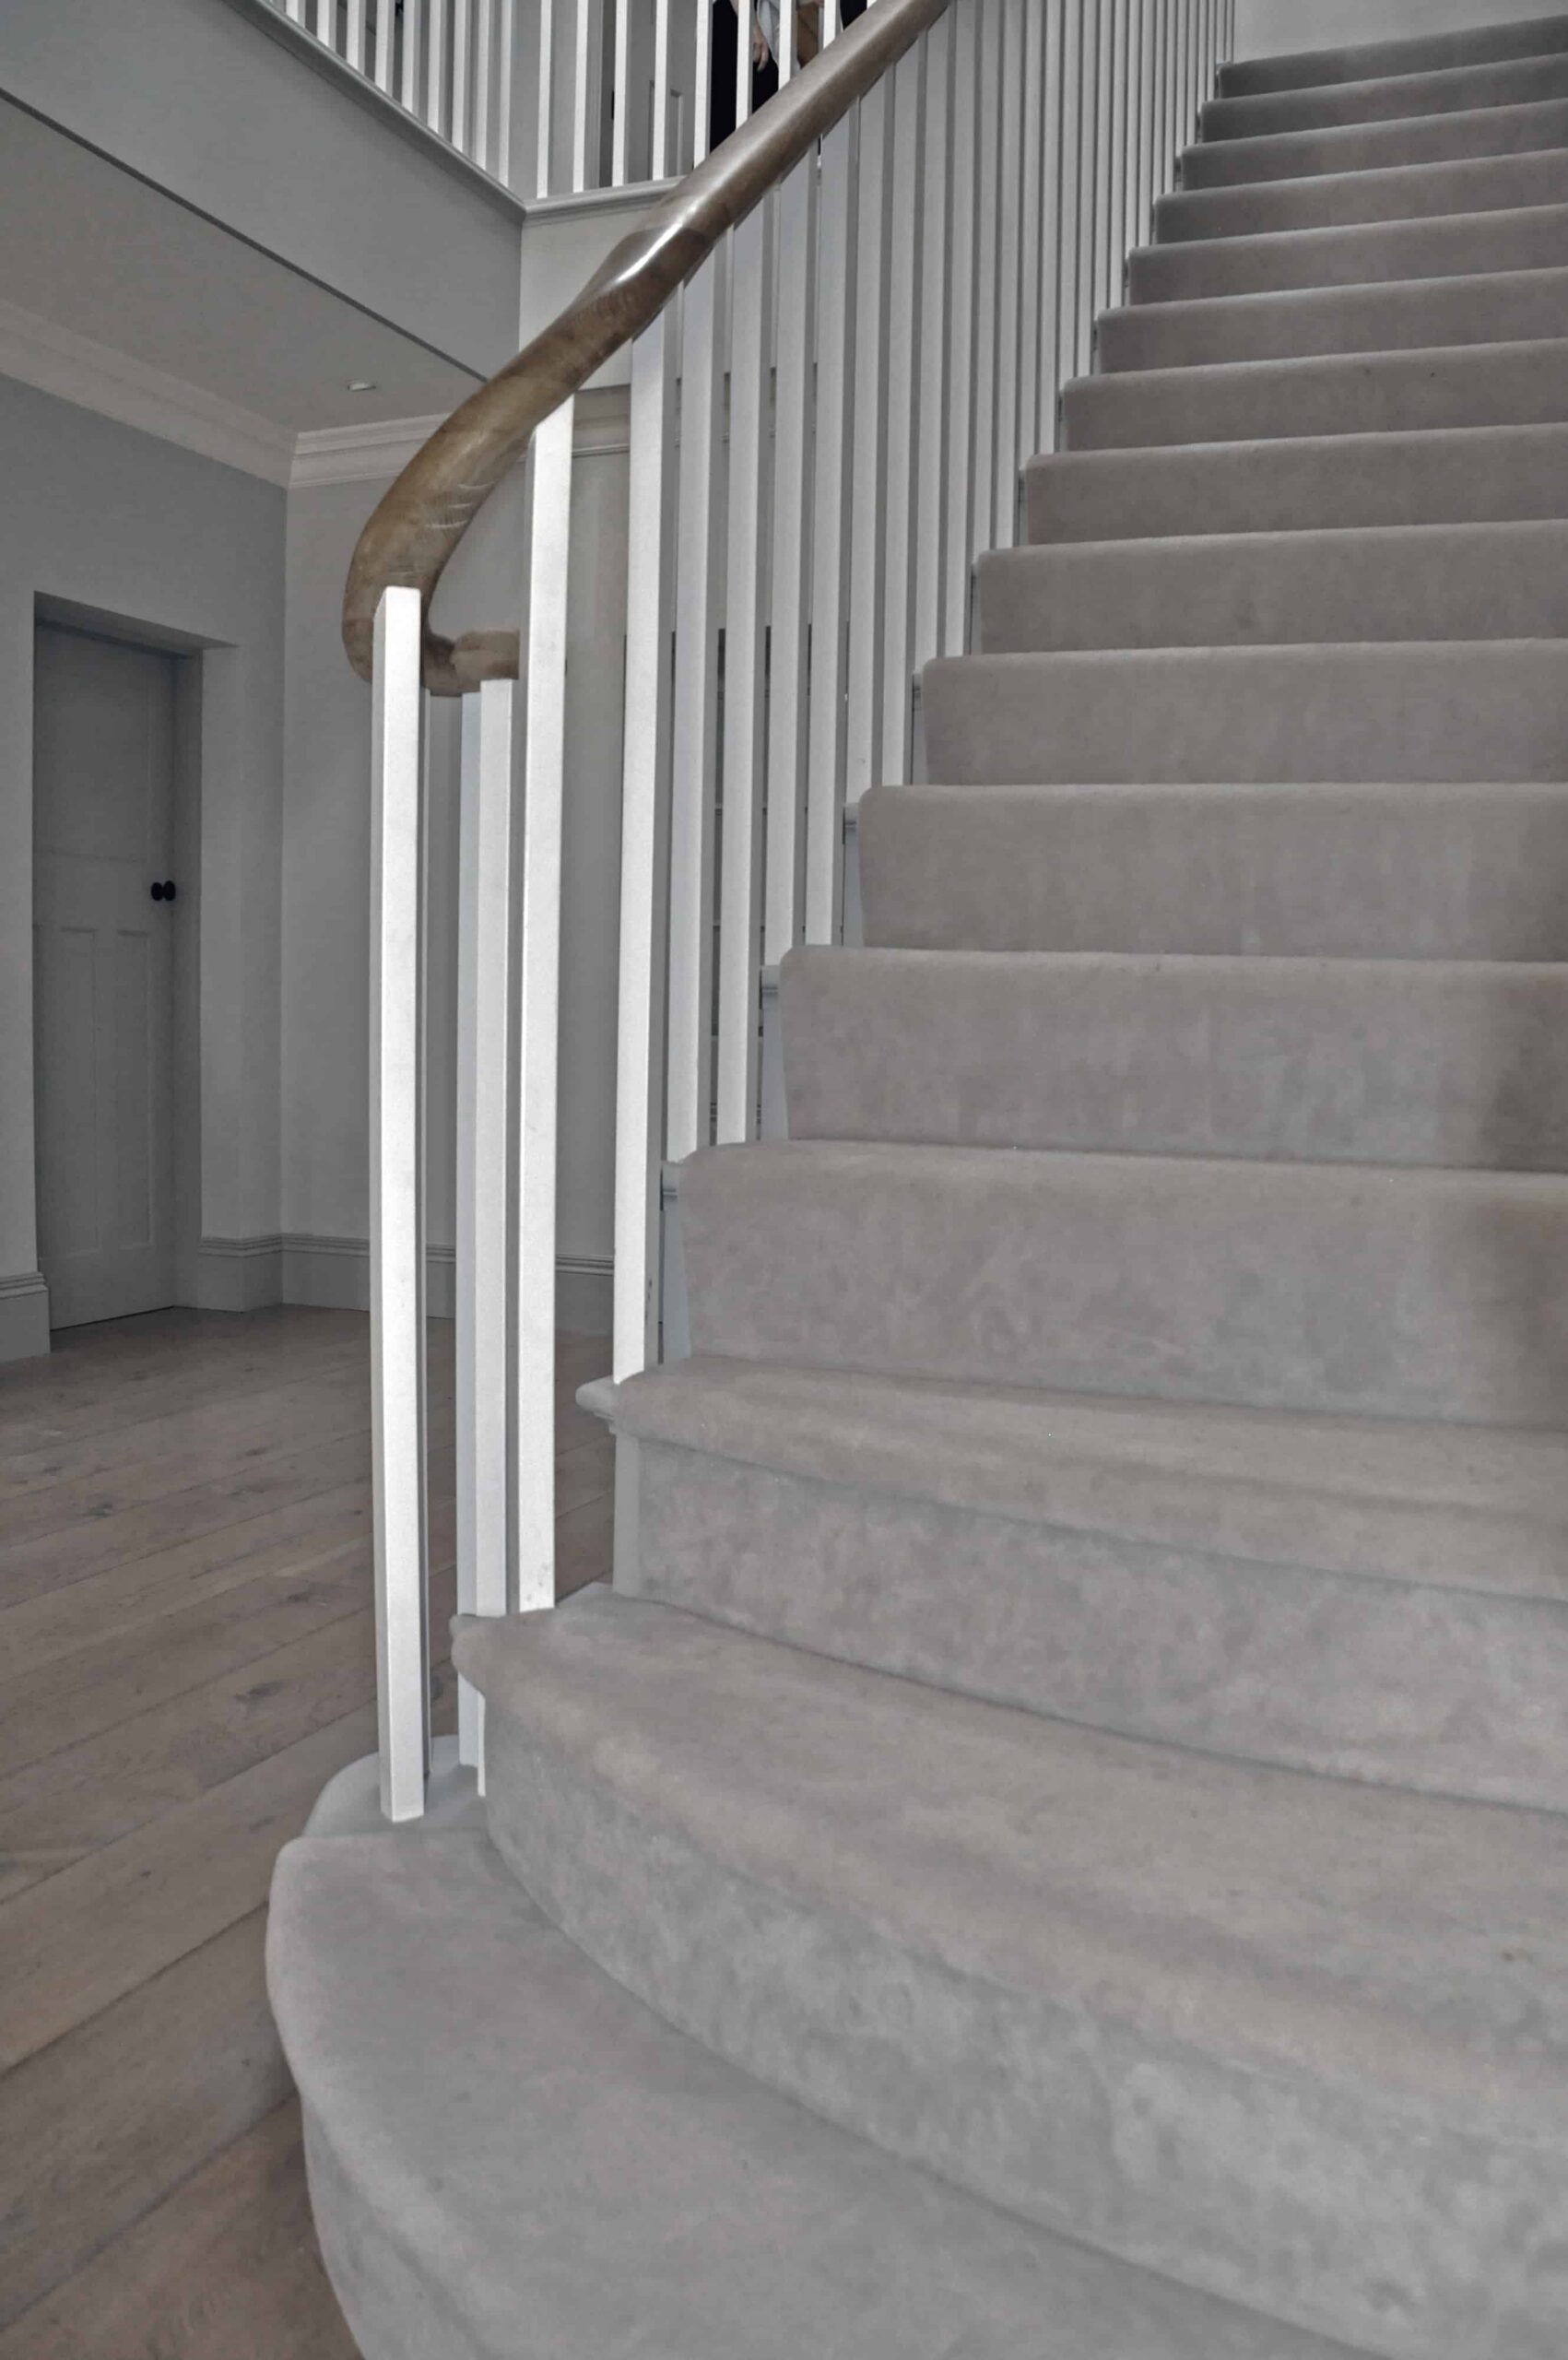 12. Stairs Edit